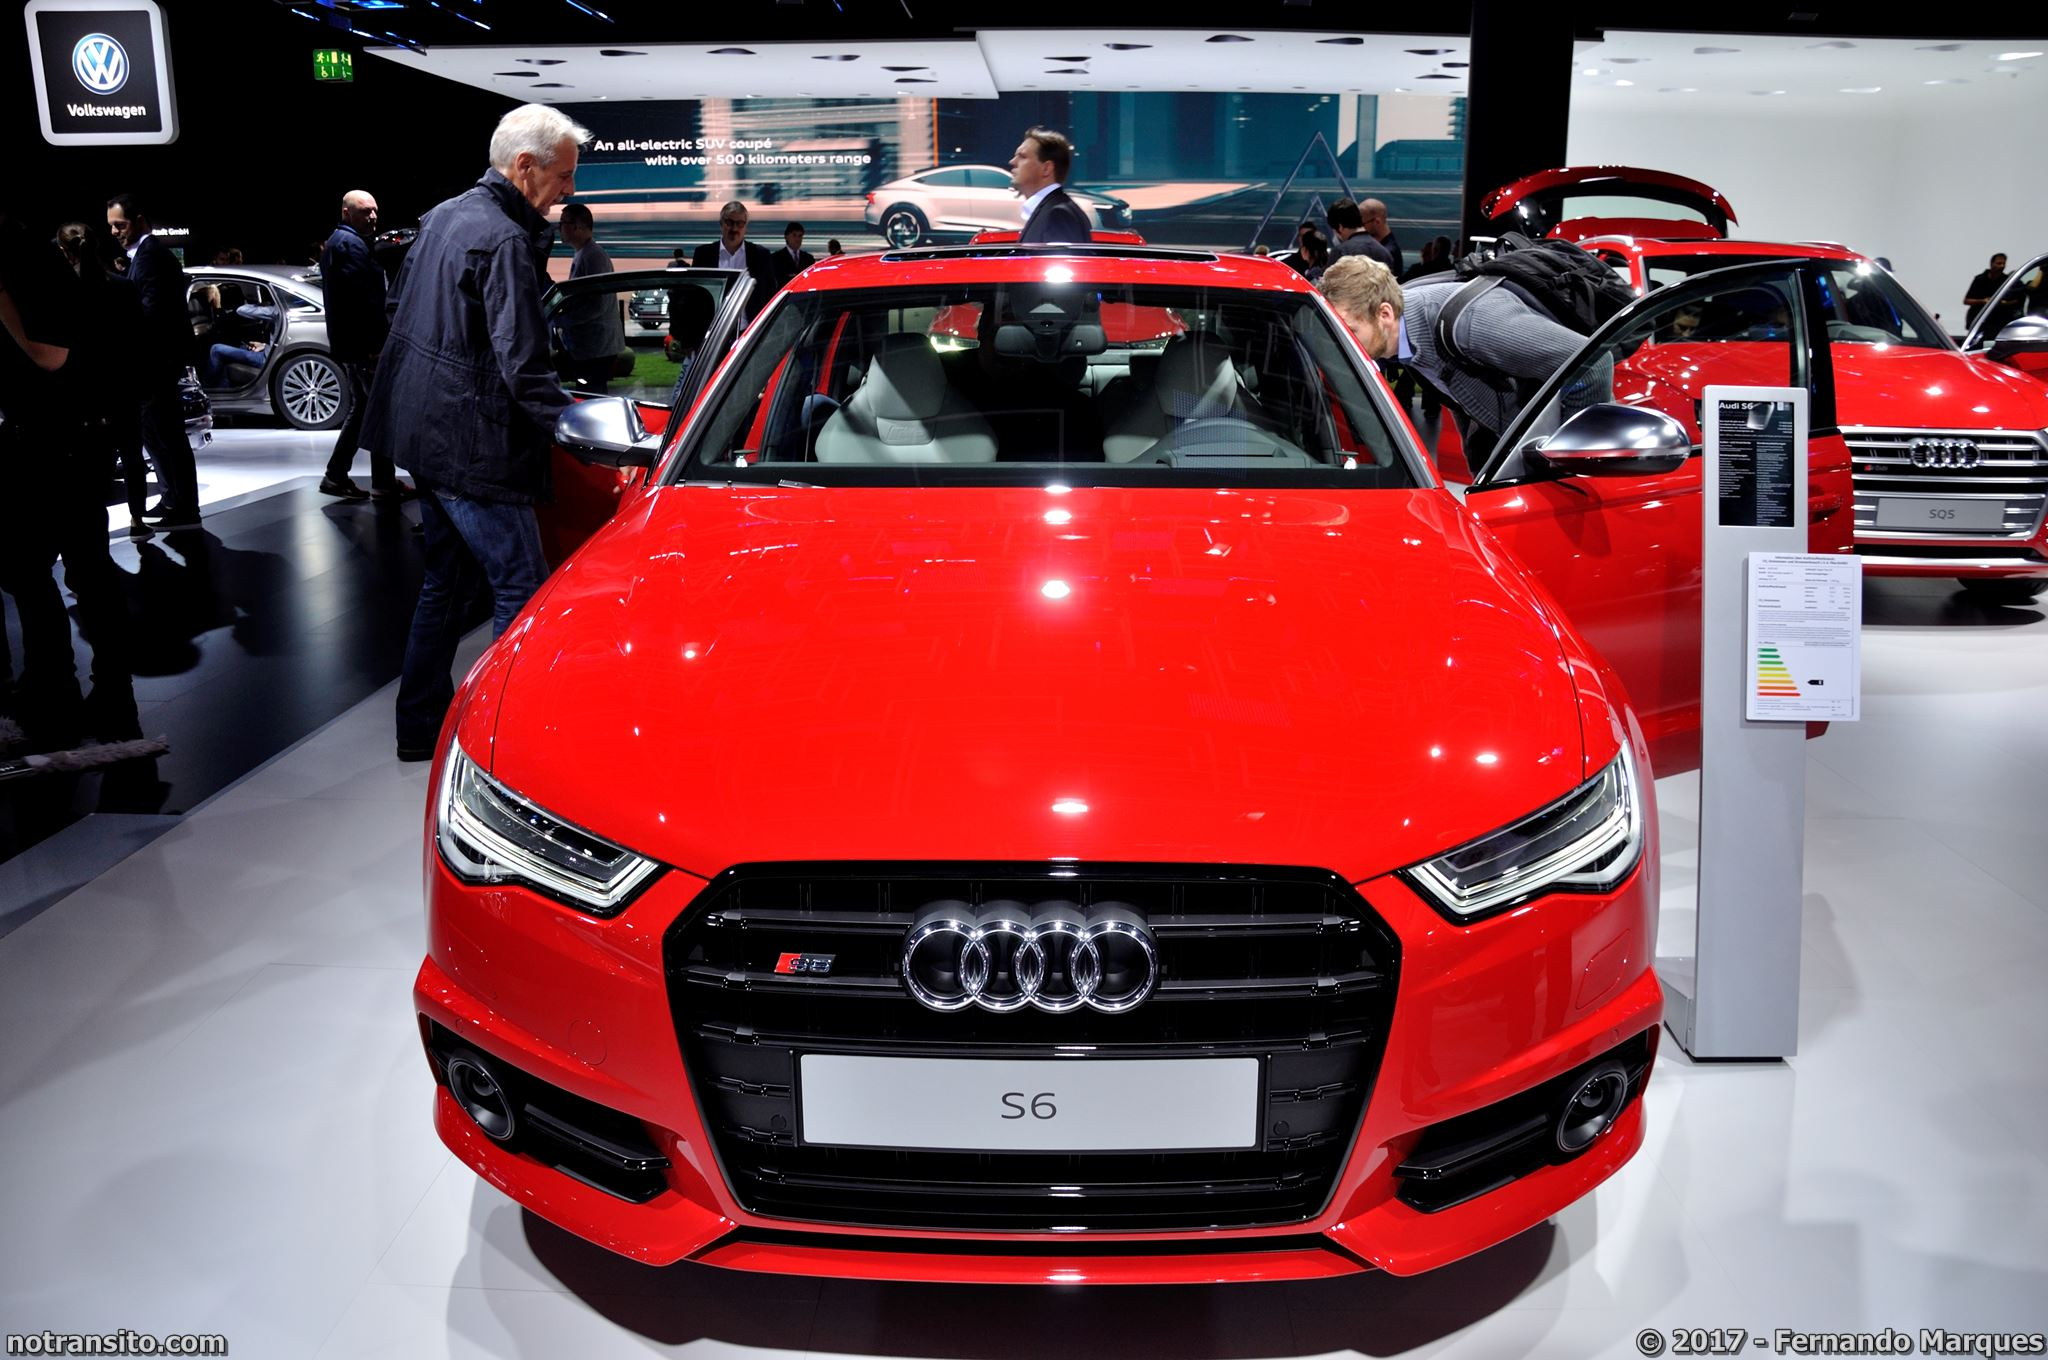 Audi-S6-Frankfurt-2017-001